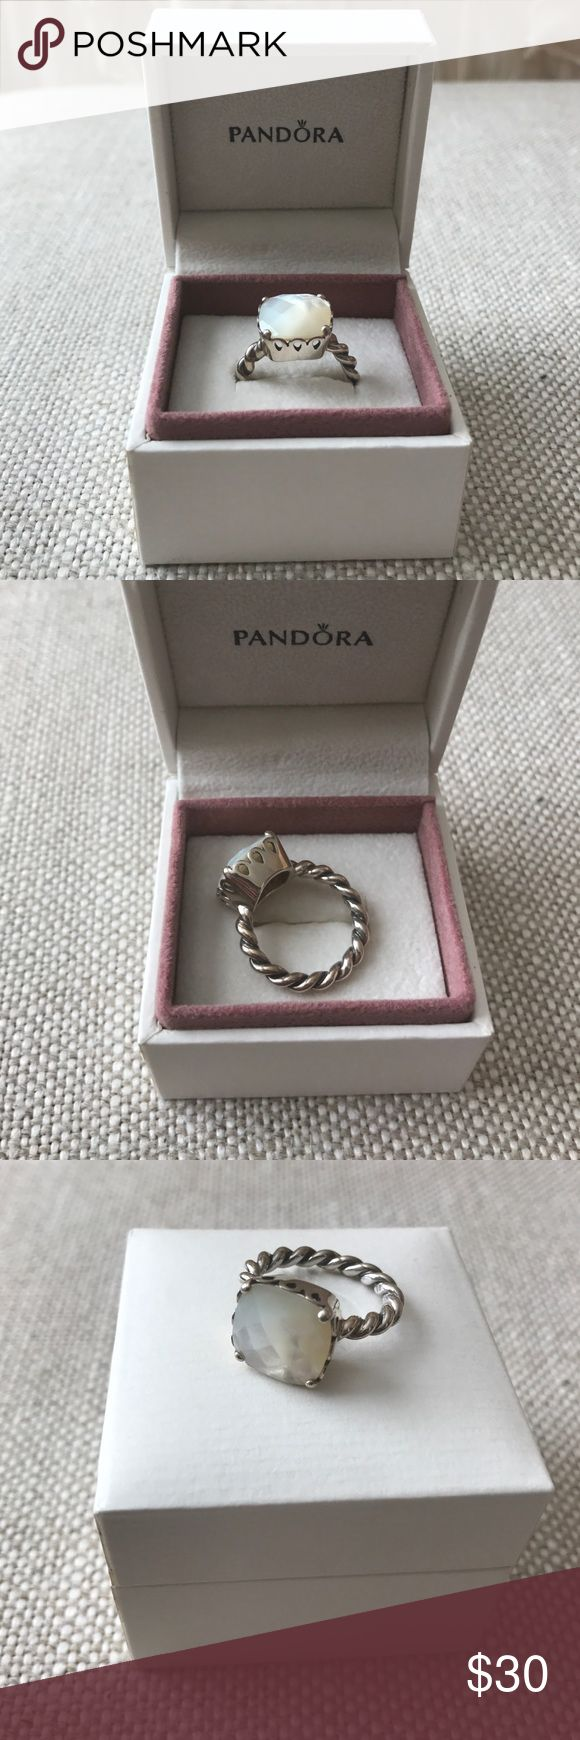 Best 25 Pandora Rings Ideas On Pinterest Pandora Rings